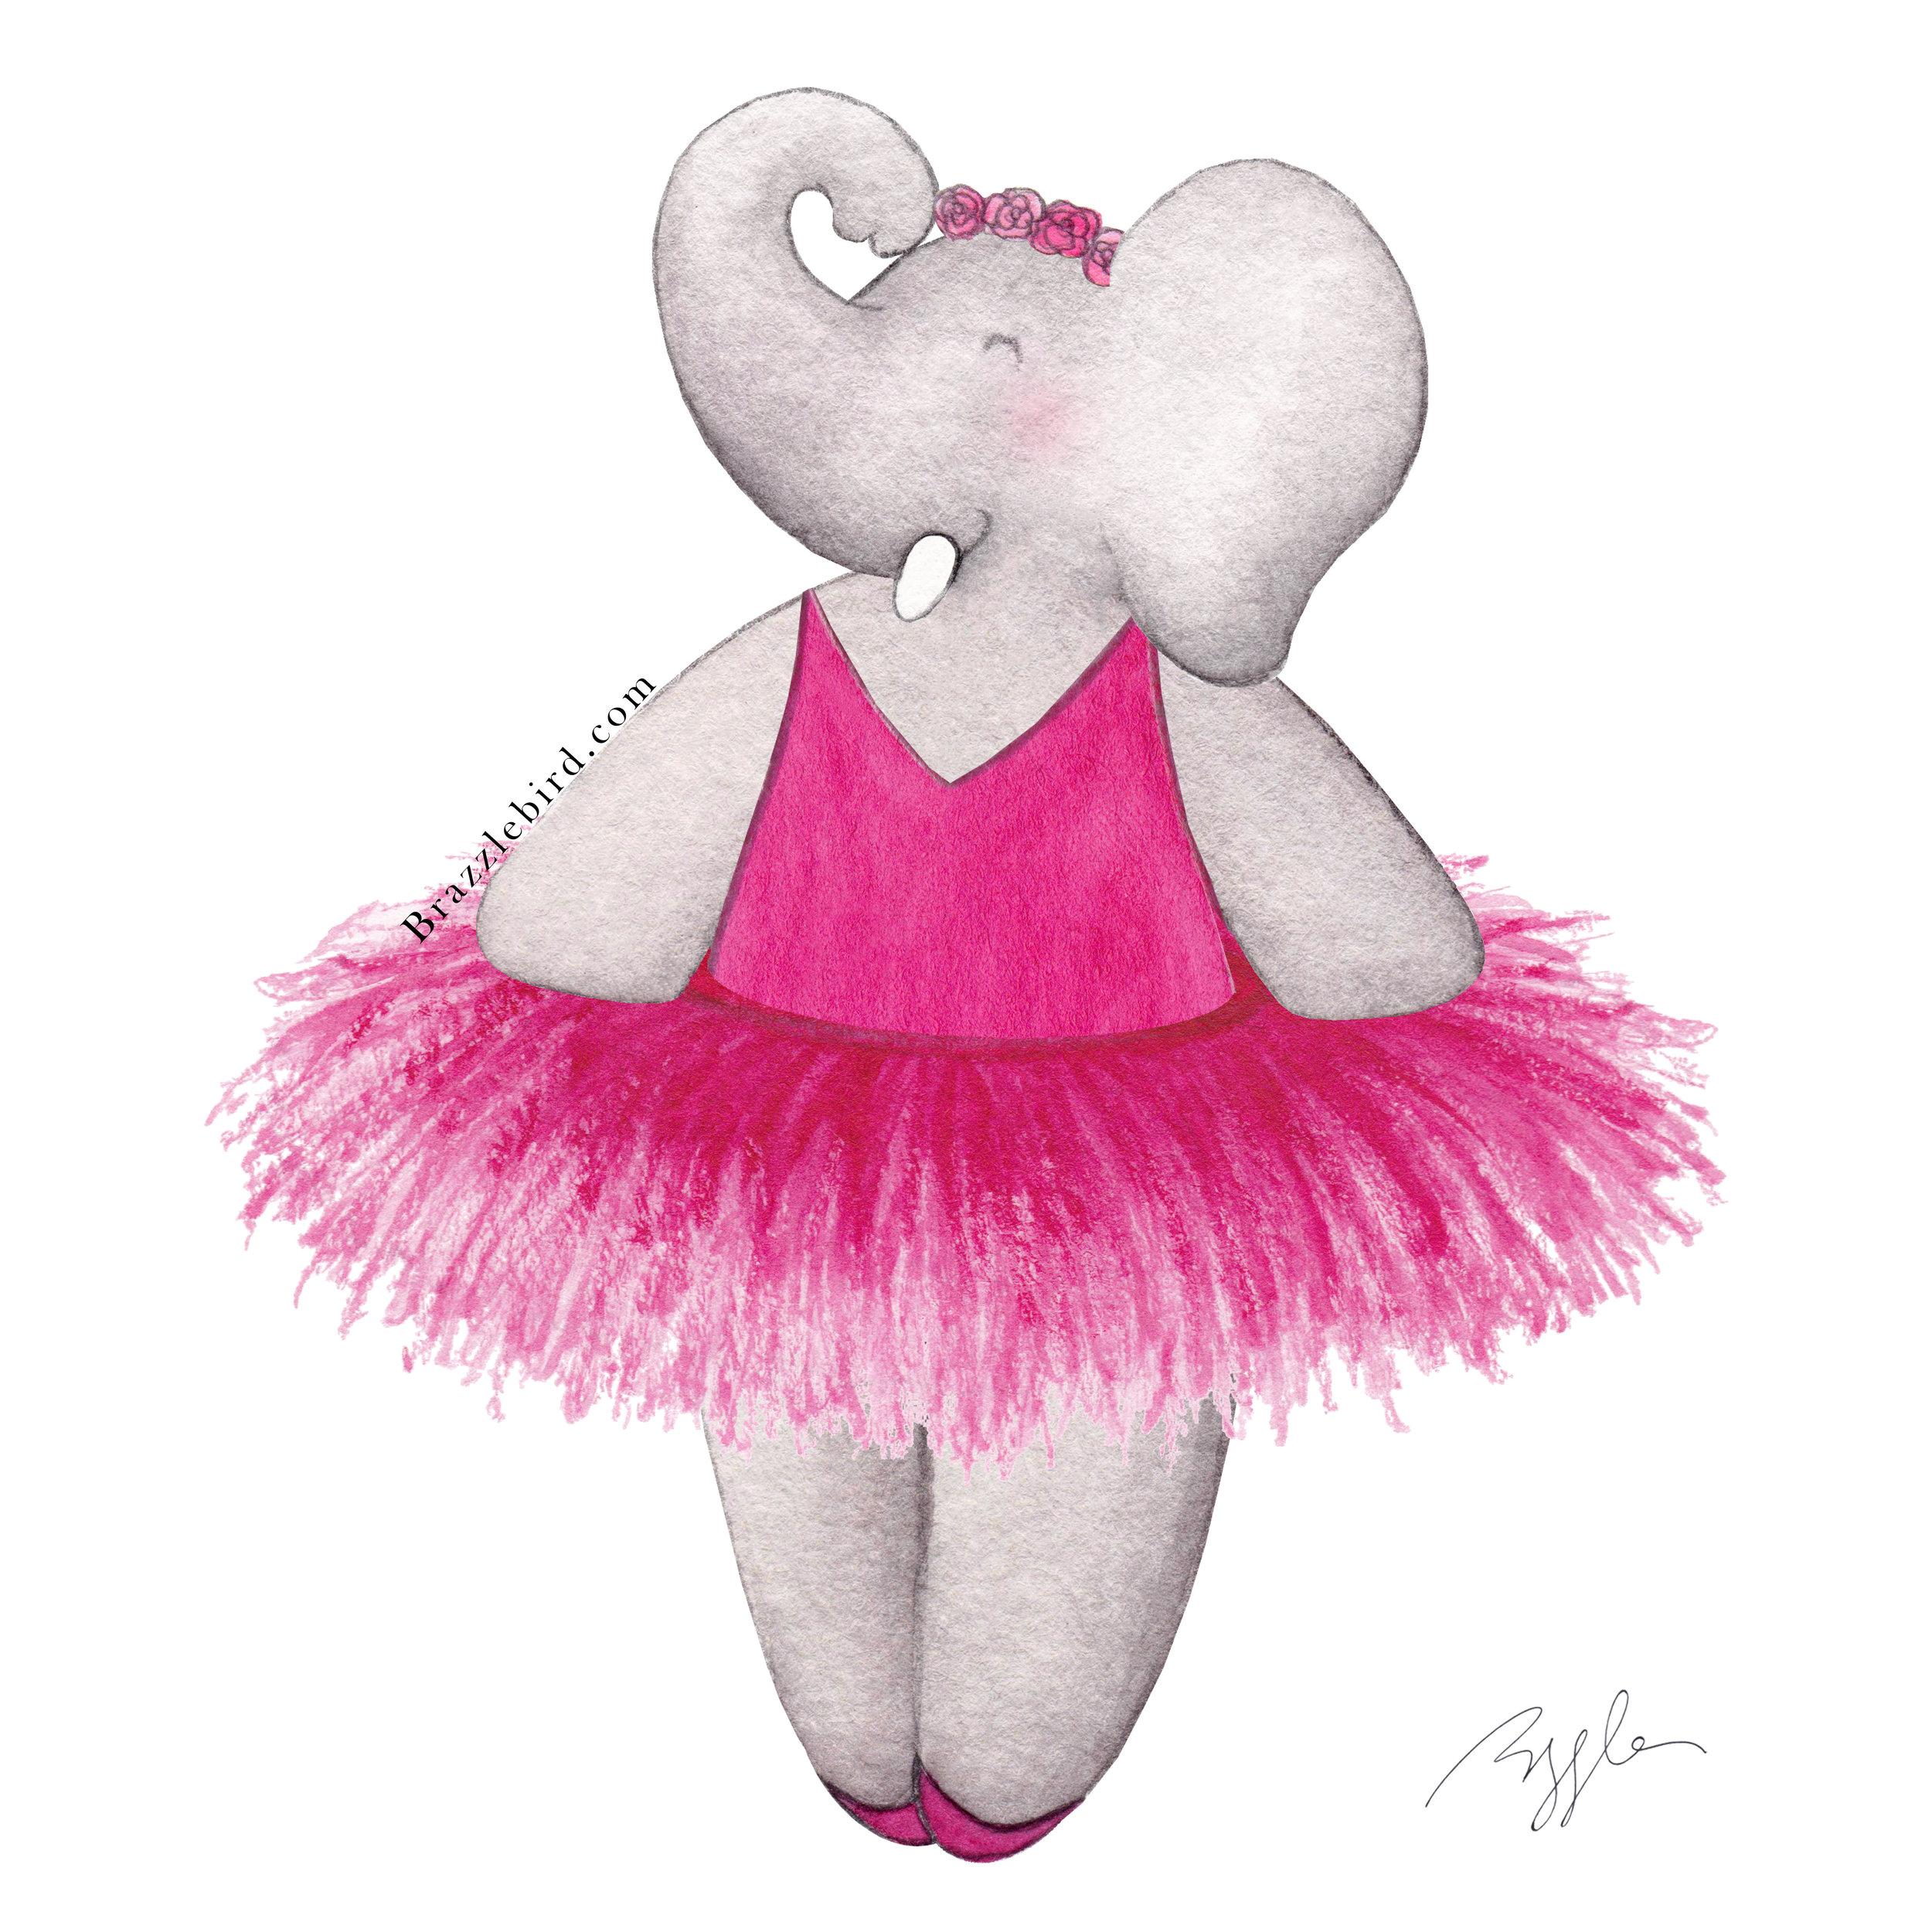 Brazzlebird - Ballerina Elephant Pink Tutu